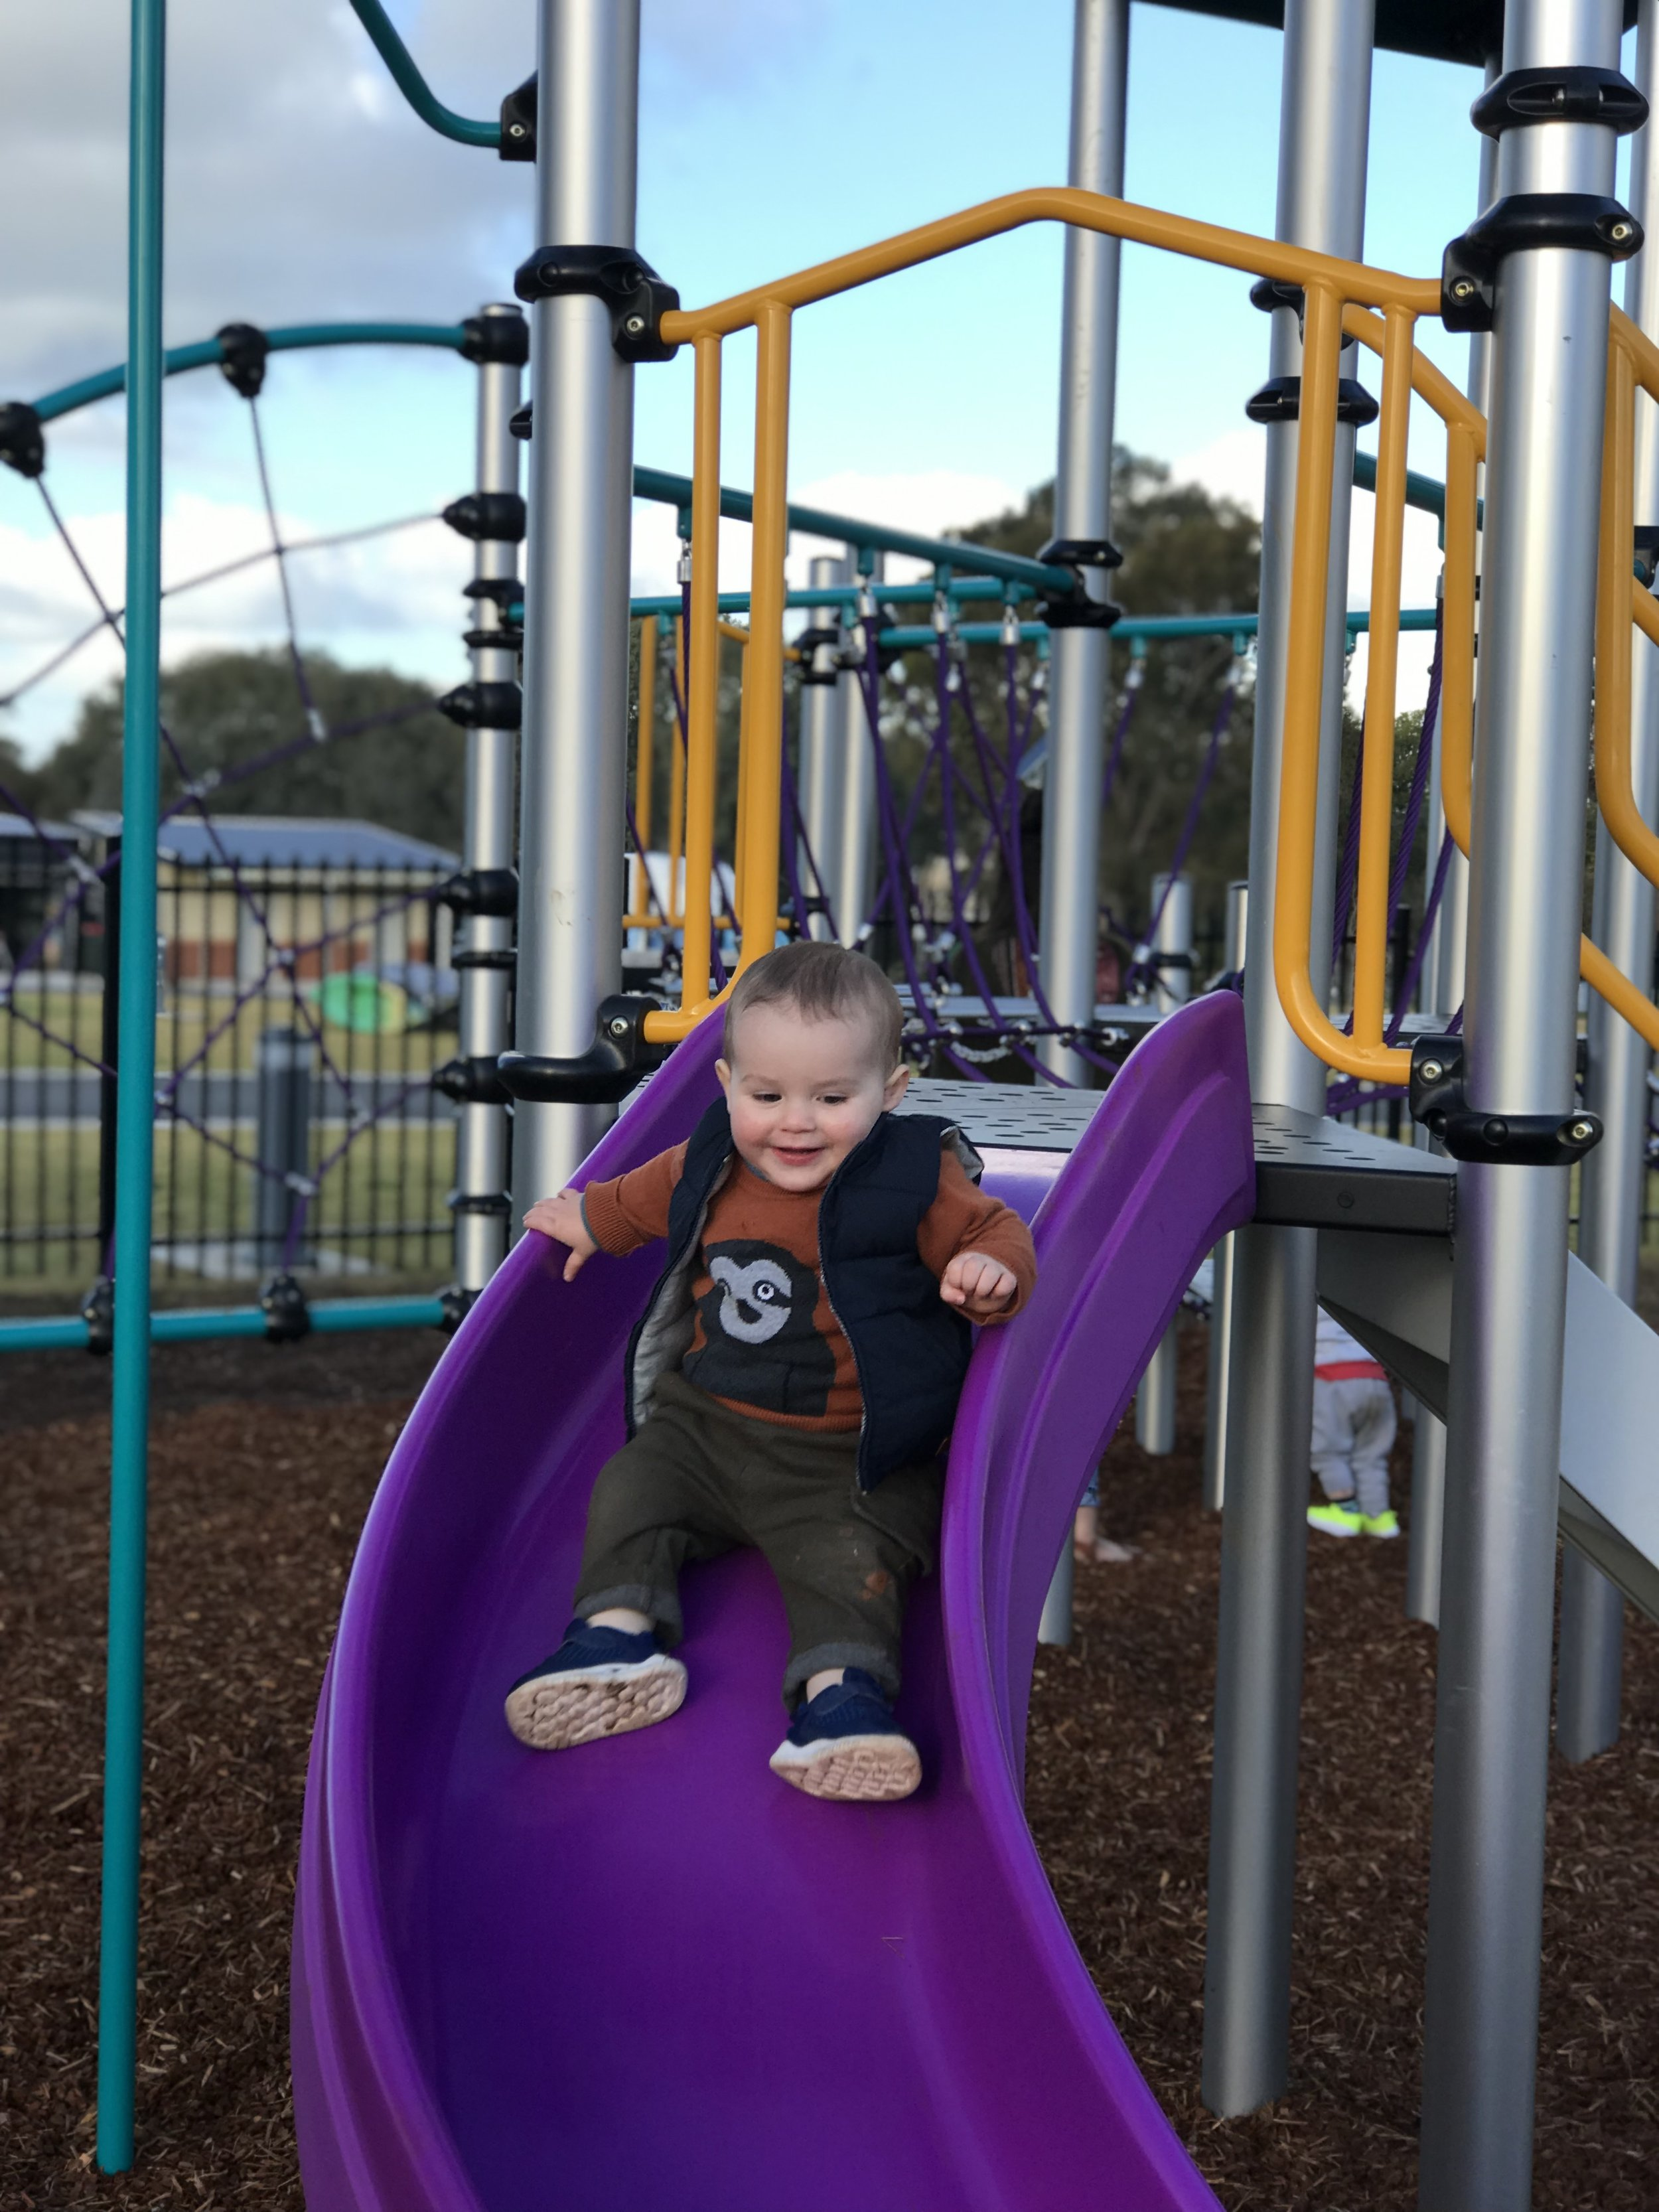 New playground at Redgrave Park